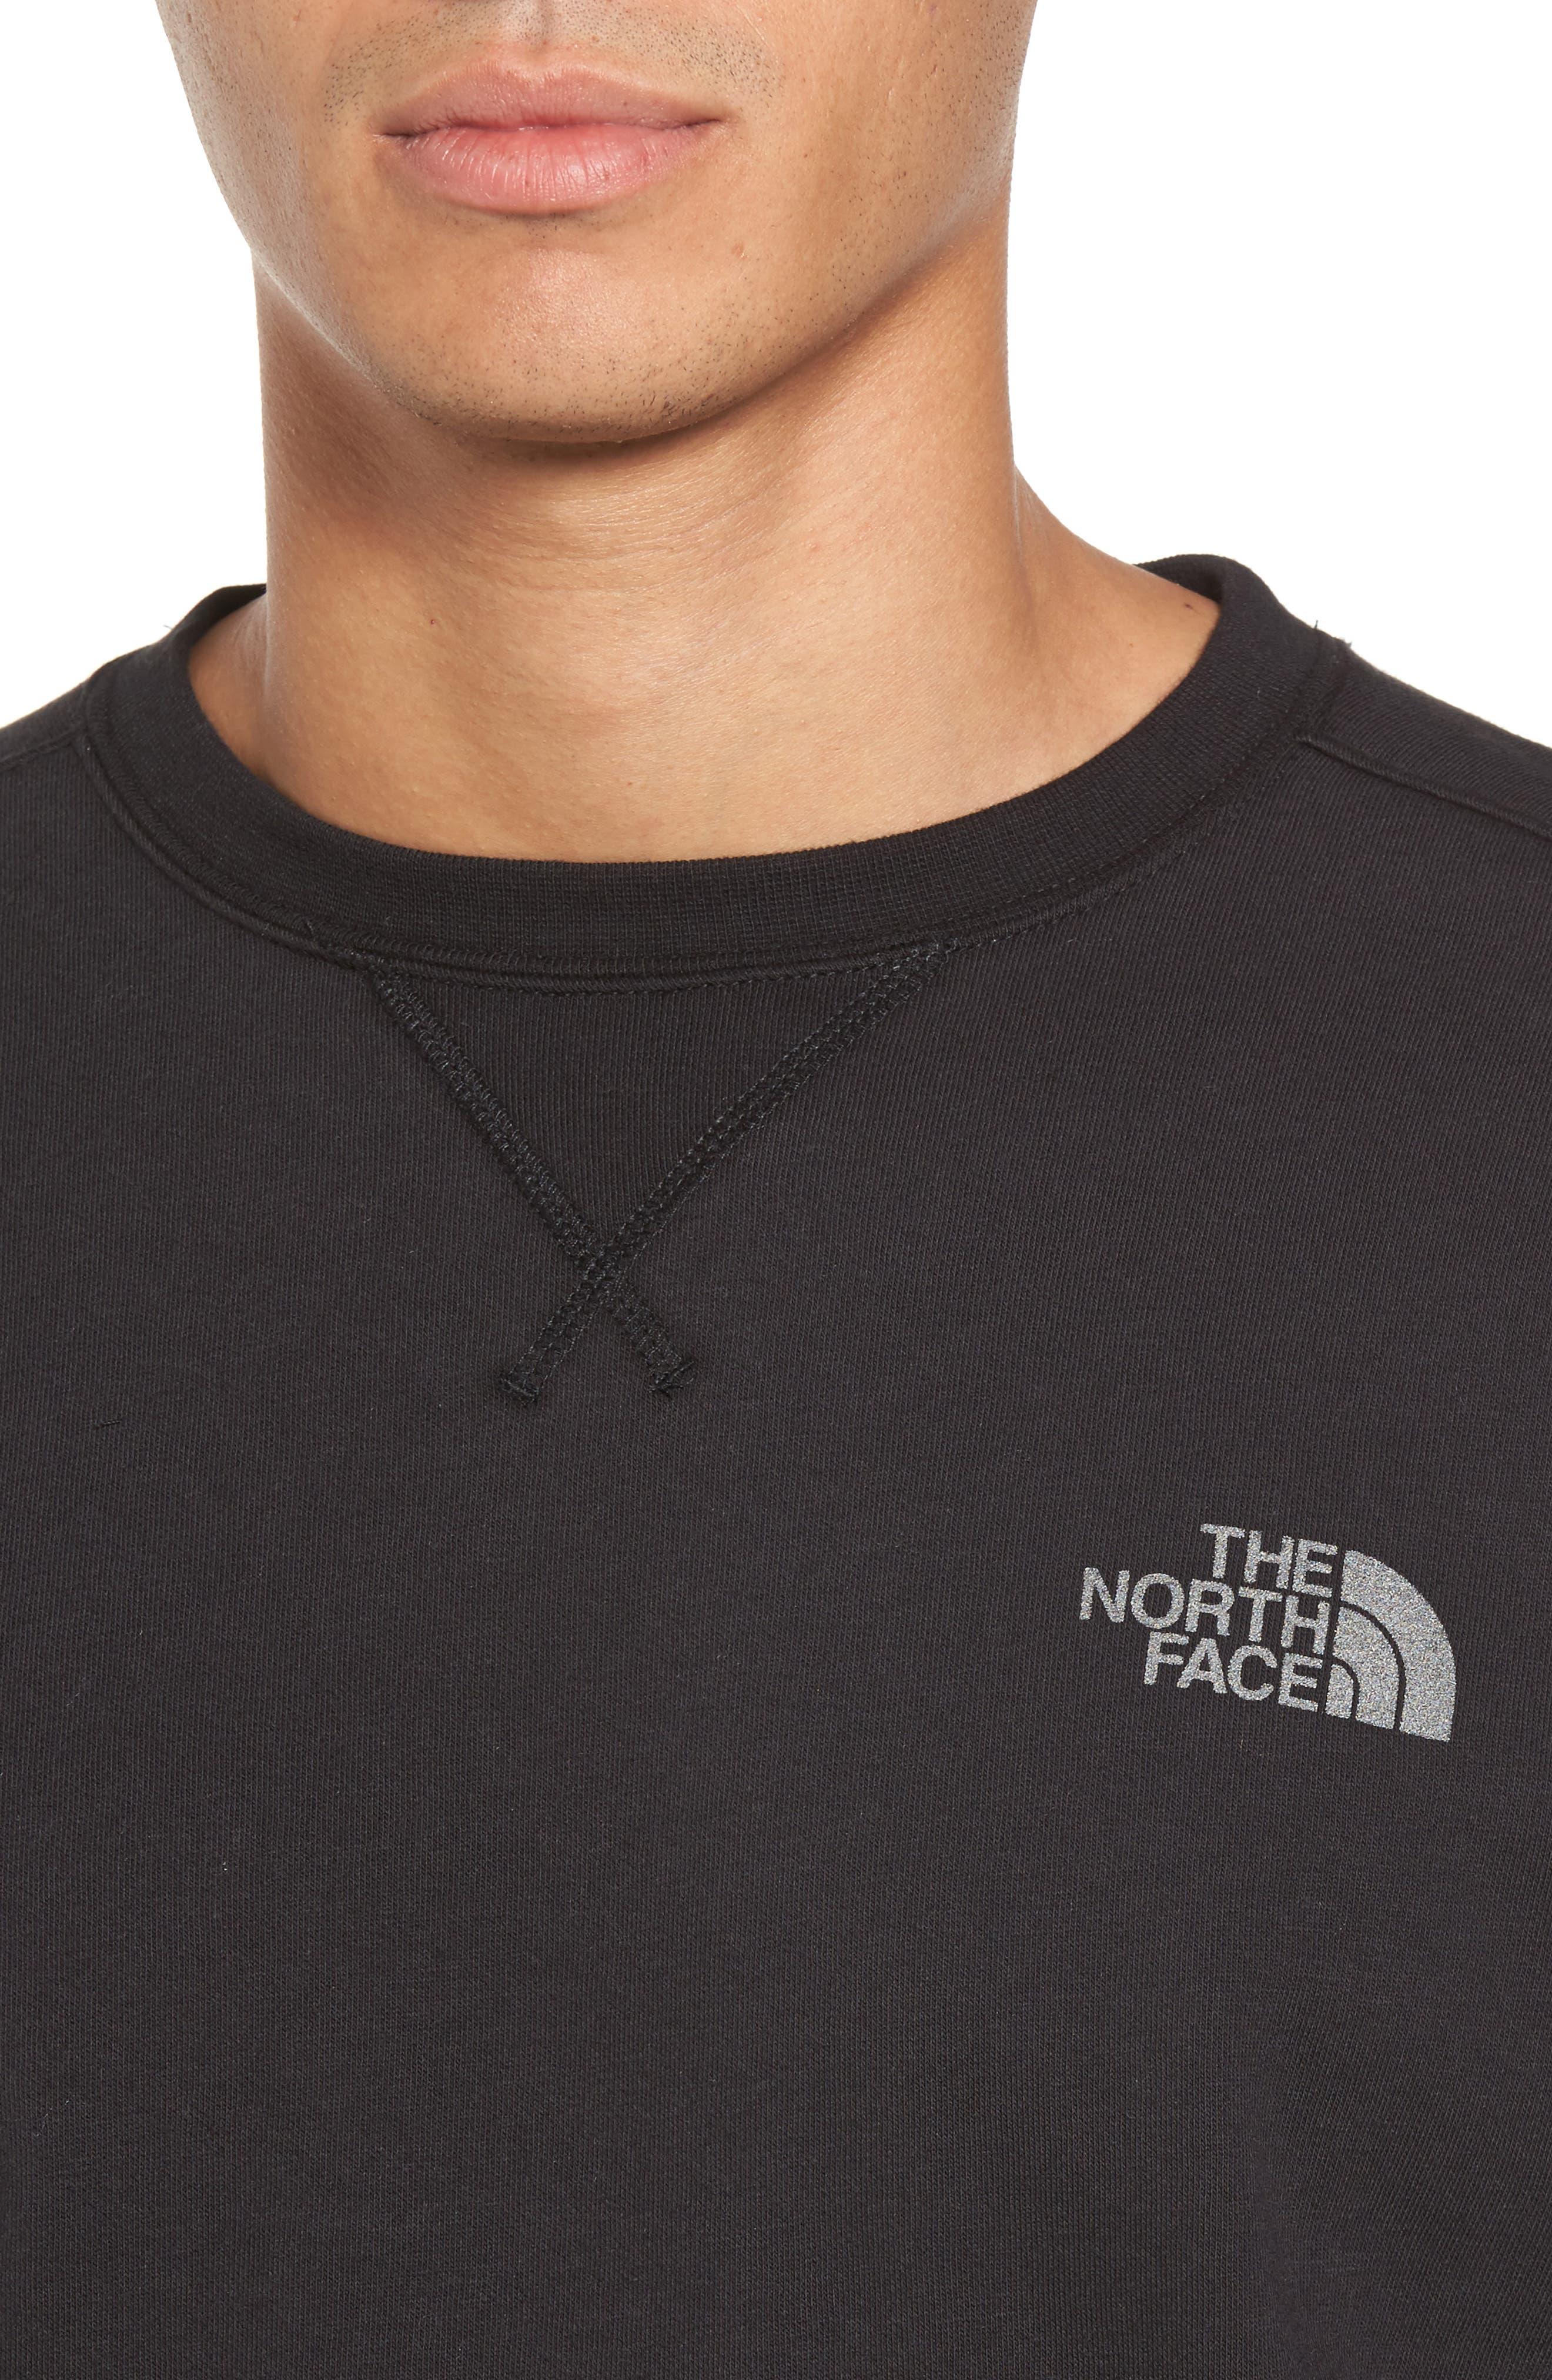 'Half Dome' Crewneck Sweatshirt,                             Alternate thumbnail 4, color,                             002